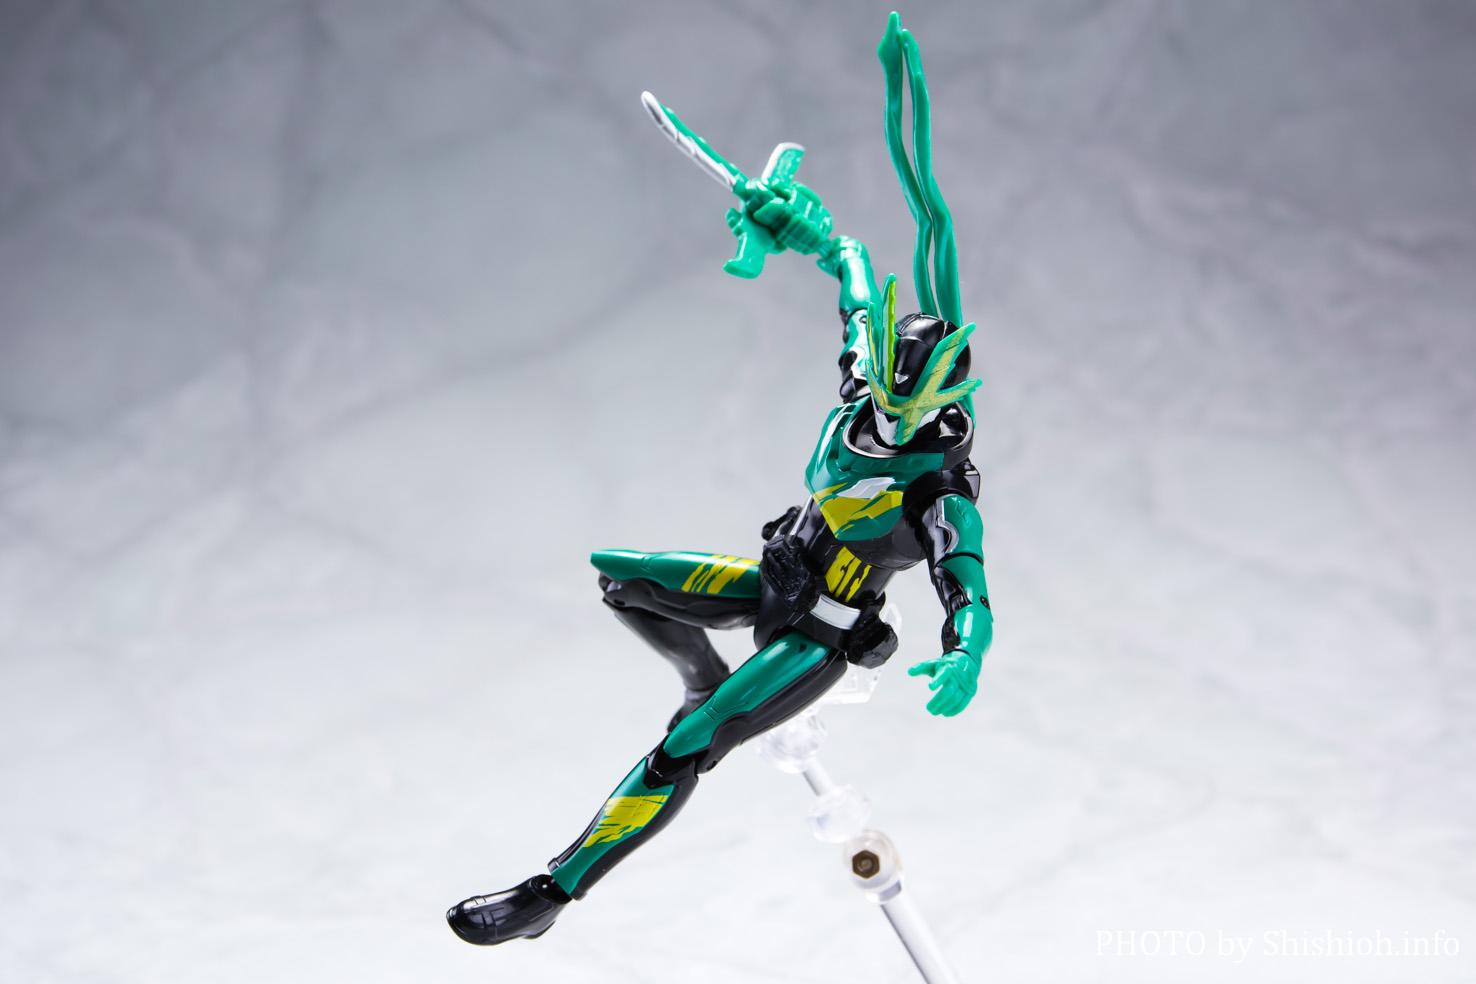 RKF 仮面ライダー剣斬 猿飛忍者伝&猿飛ぶた3フォームチェンジセット